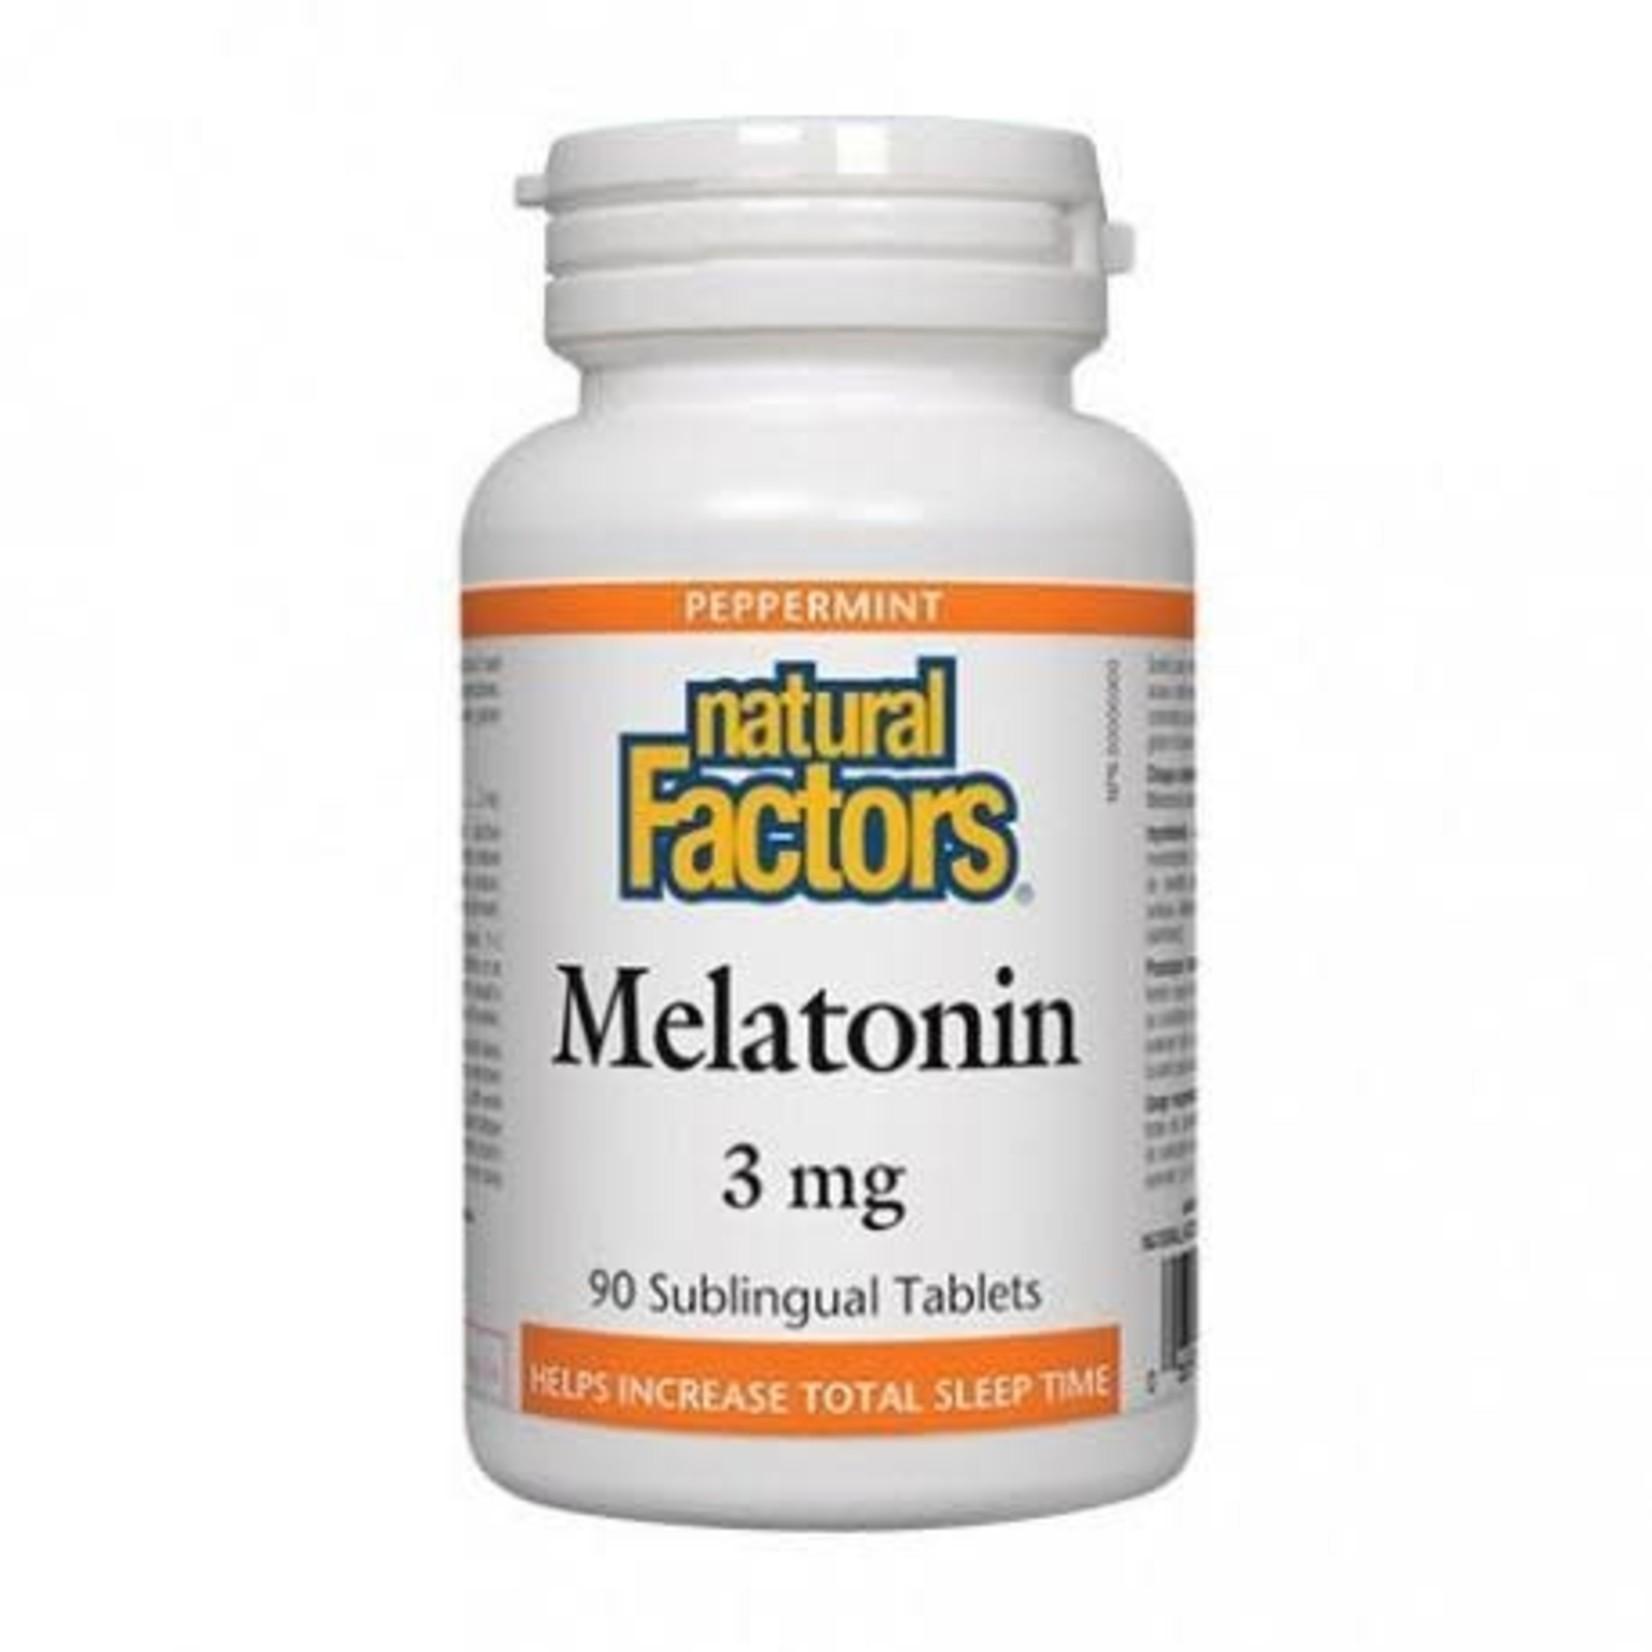 Natural Factors Natural Factors Melatonin 3mg 90 sublingual tabs